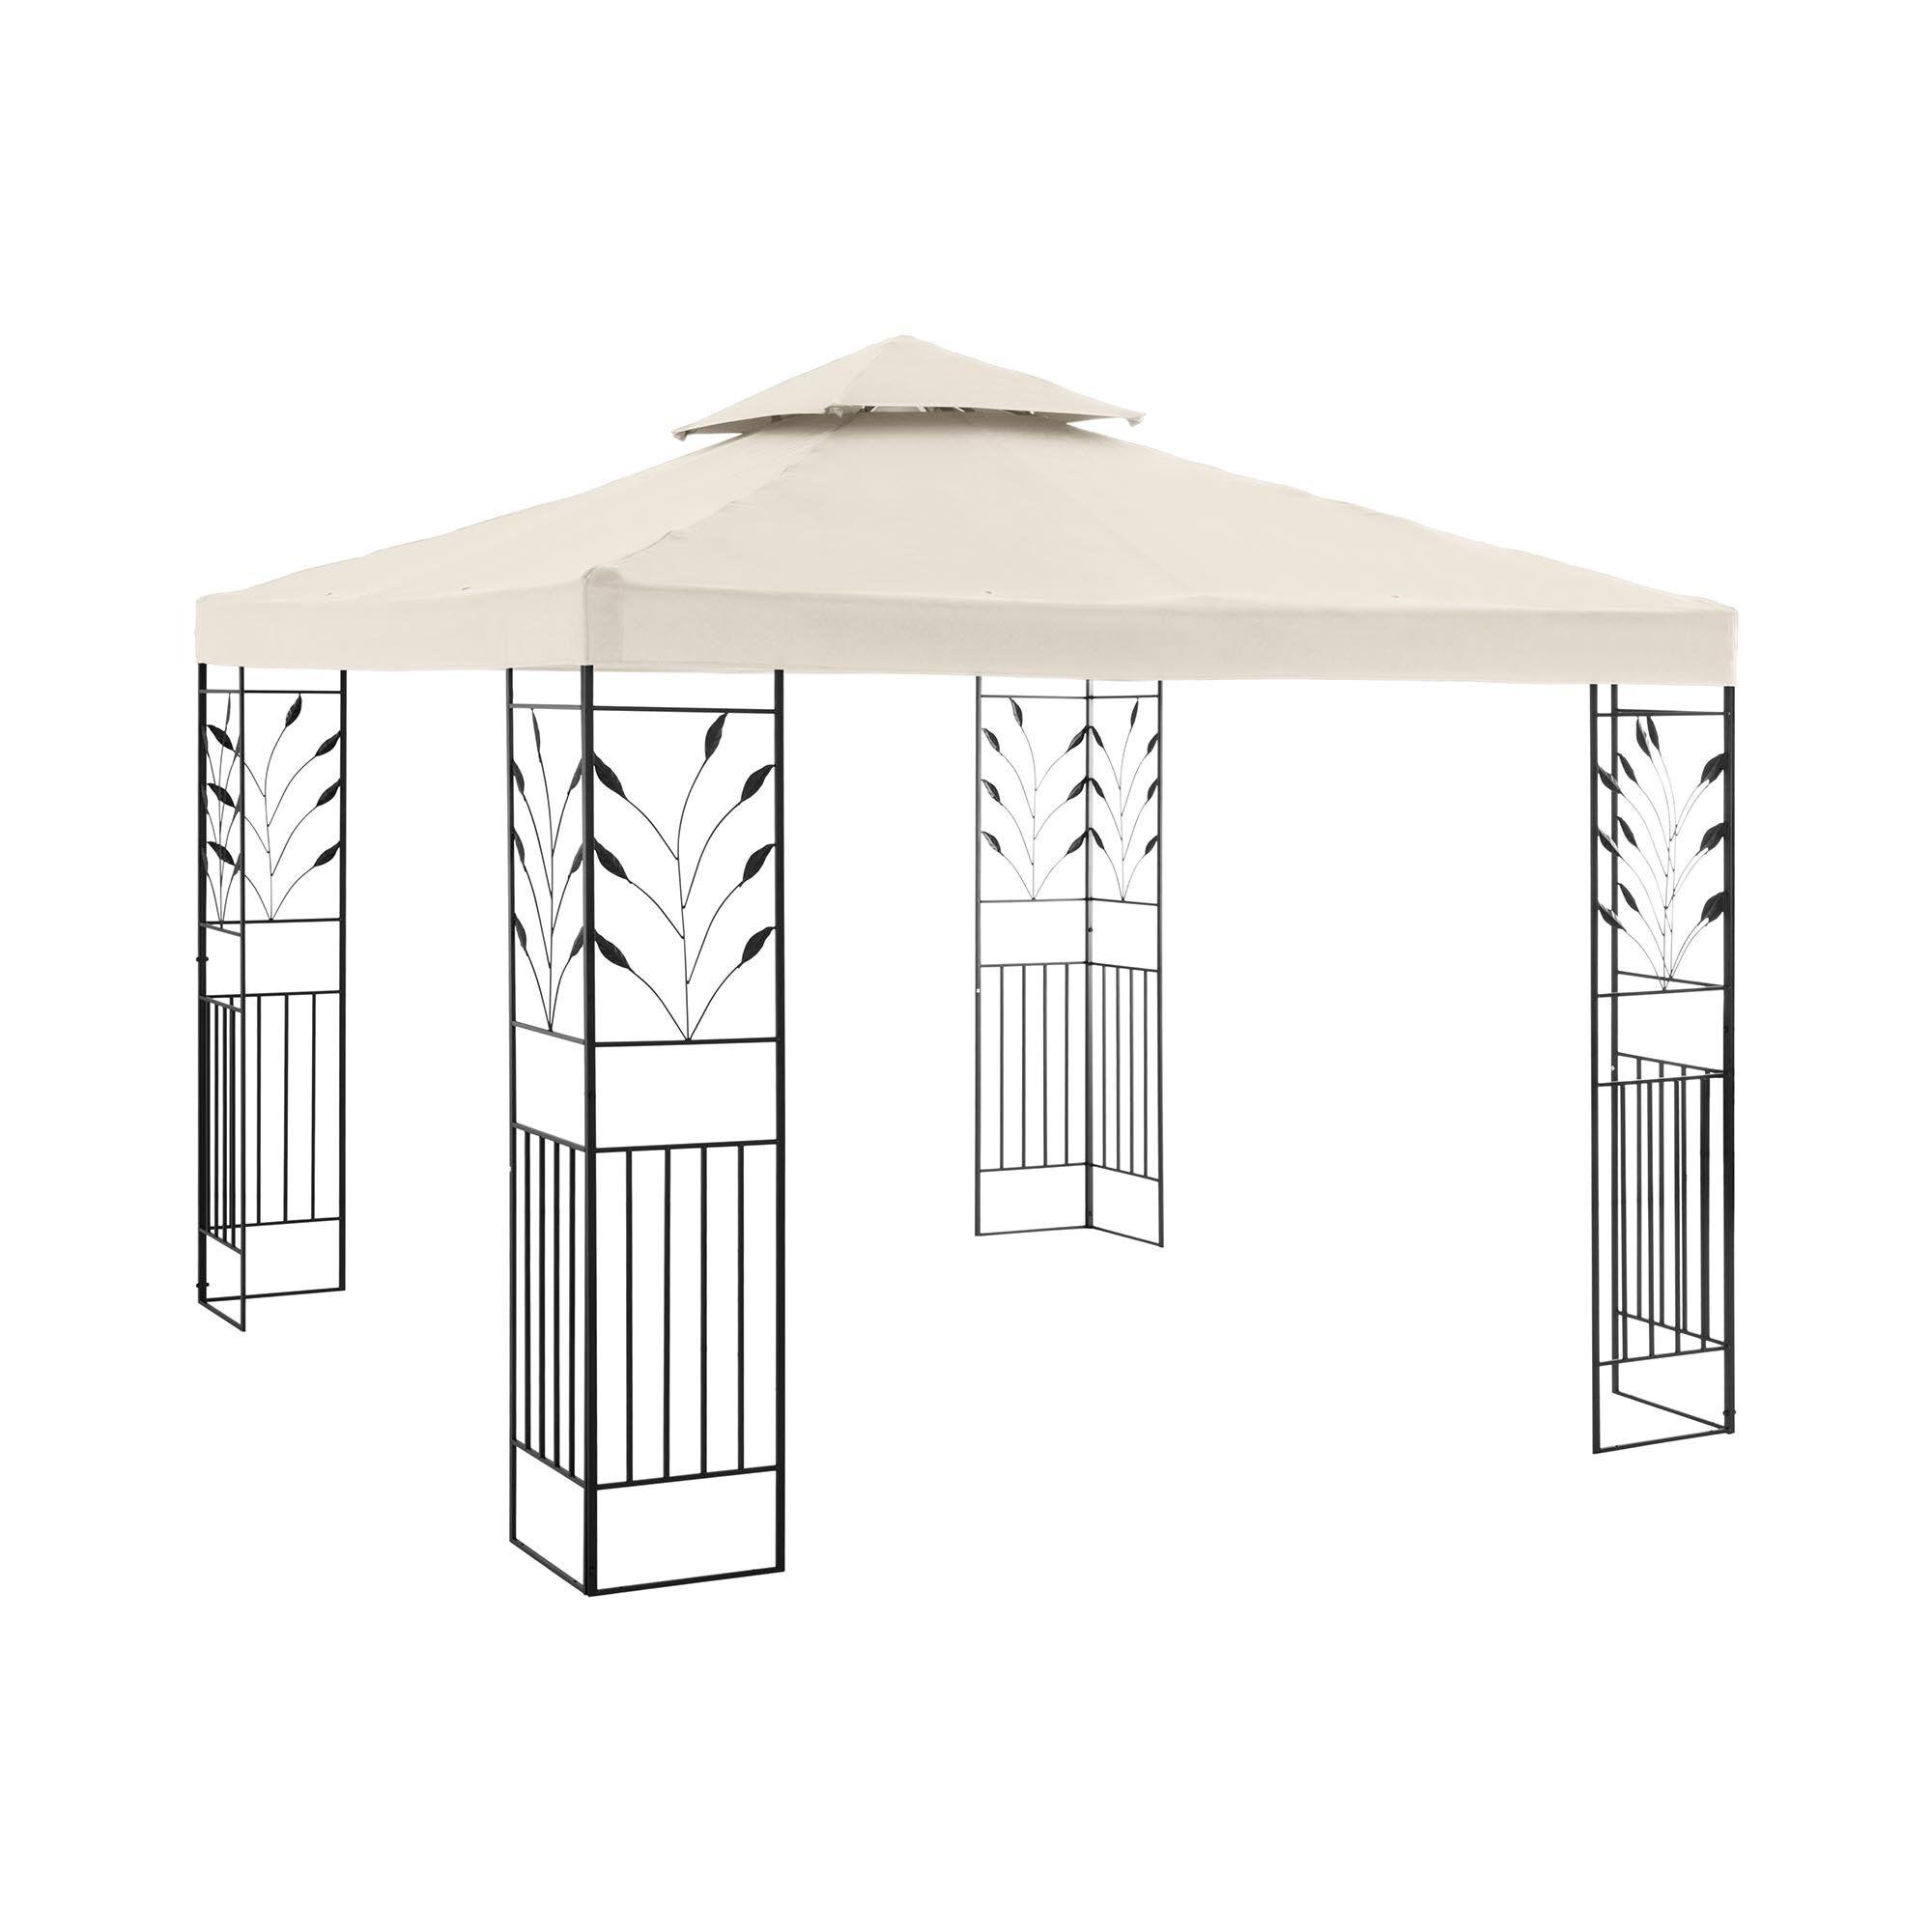 Uniprodo Garden Pavilion - 3 x 3 m - 180 g/m² - beige